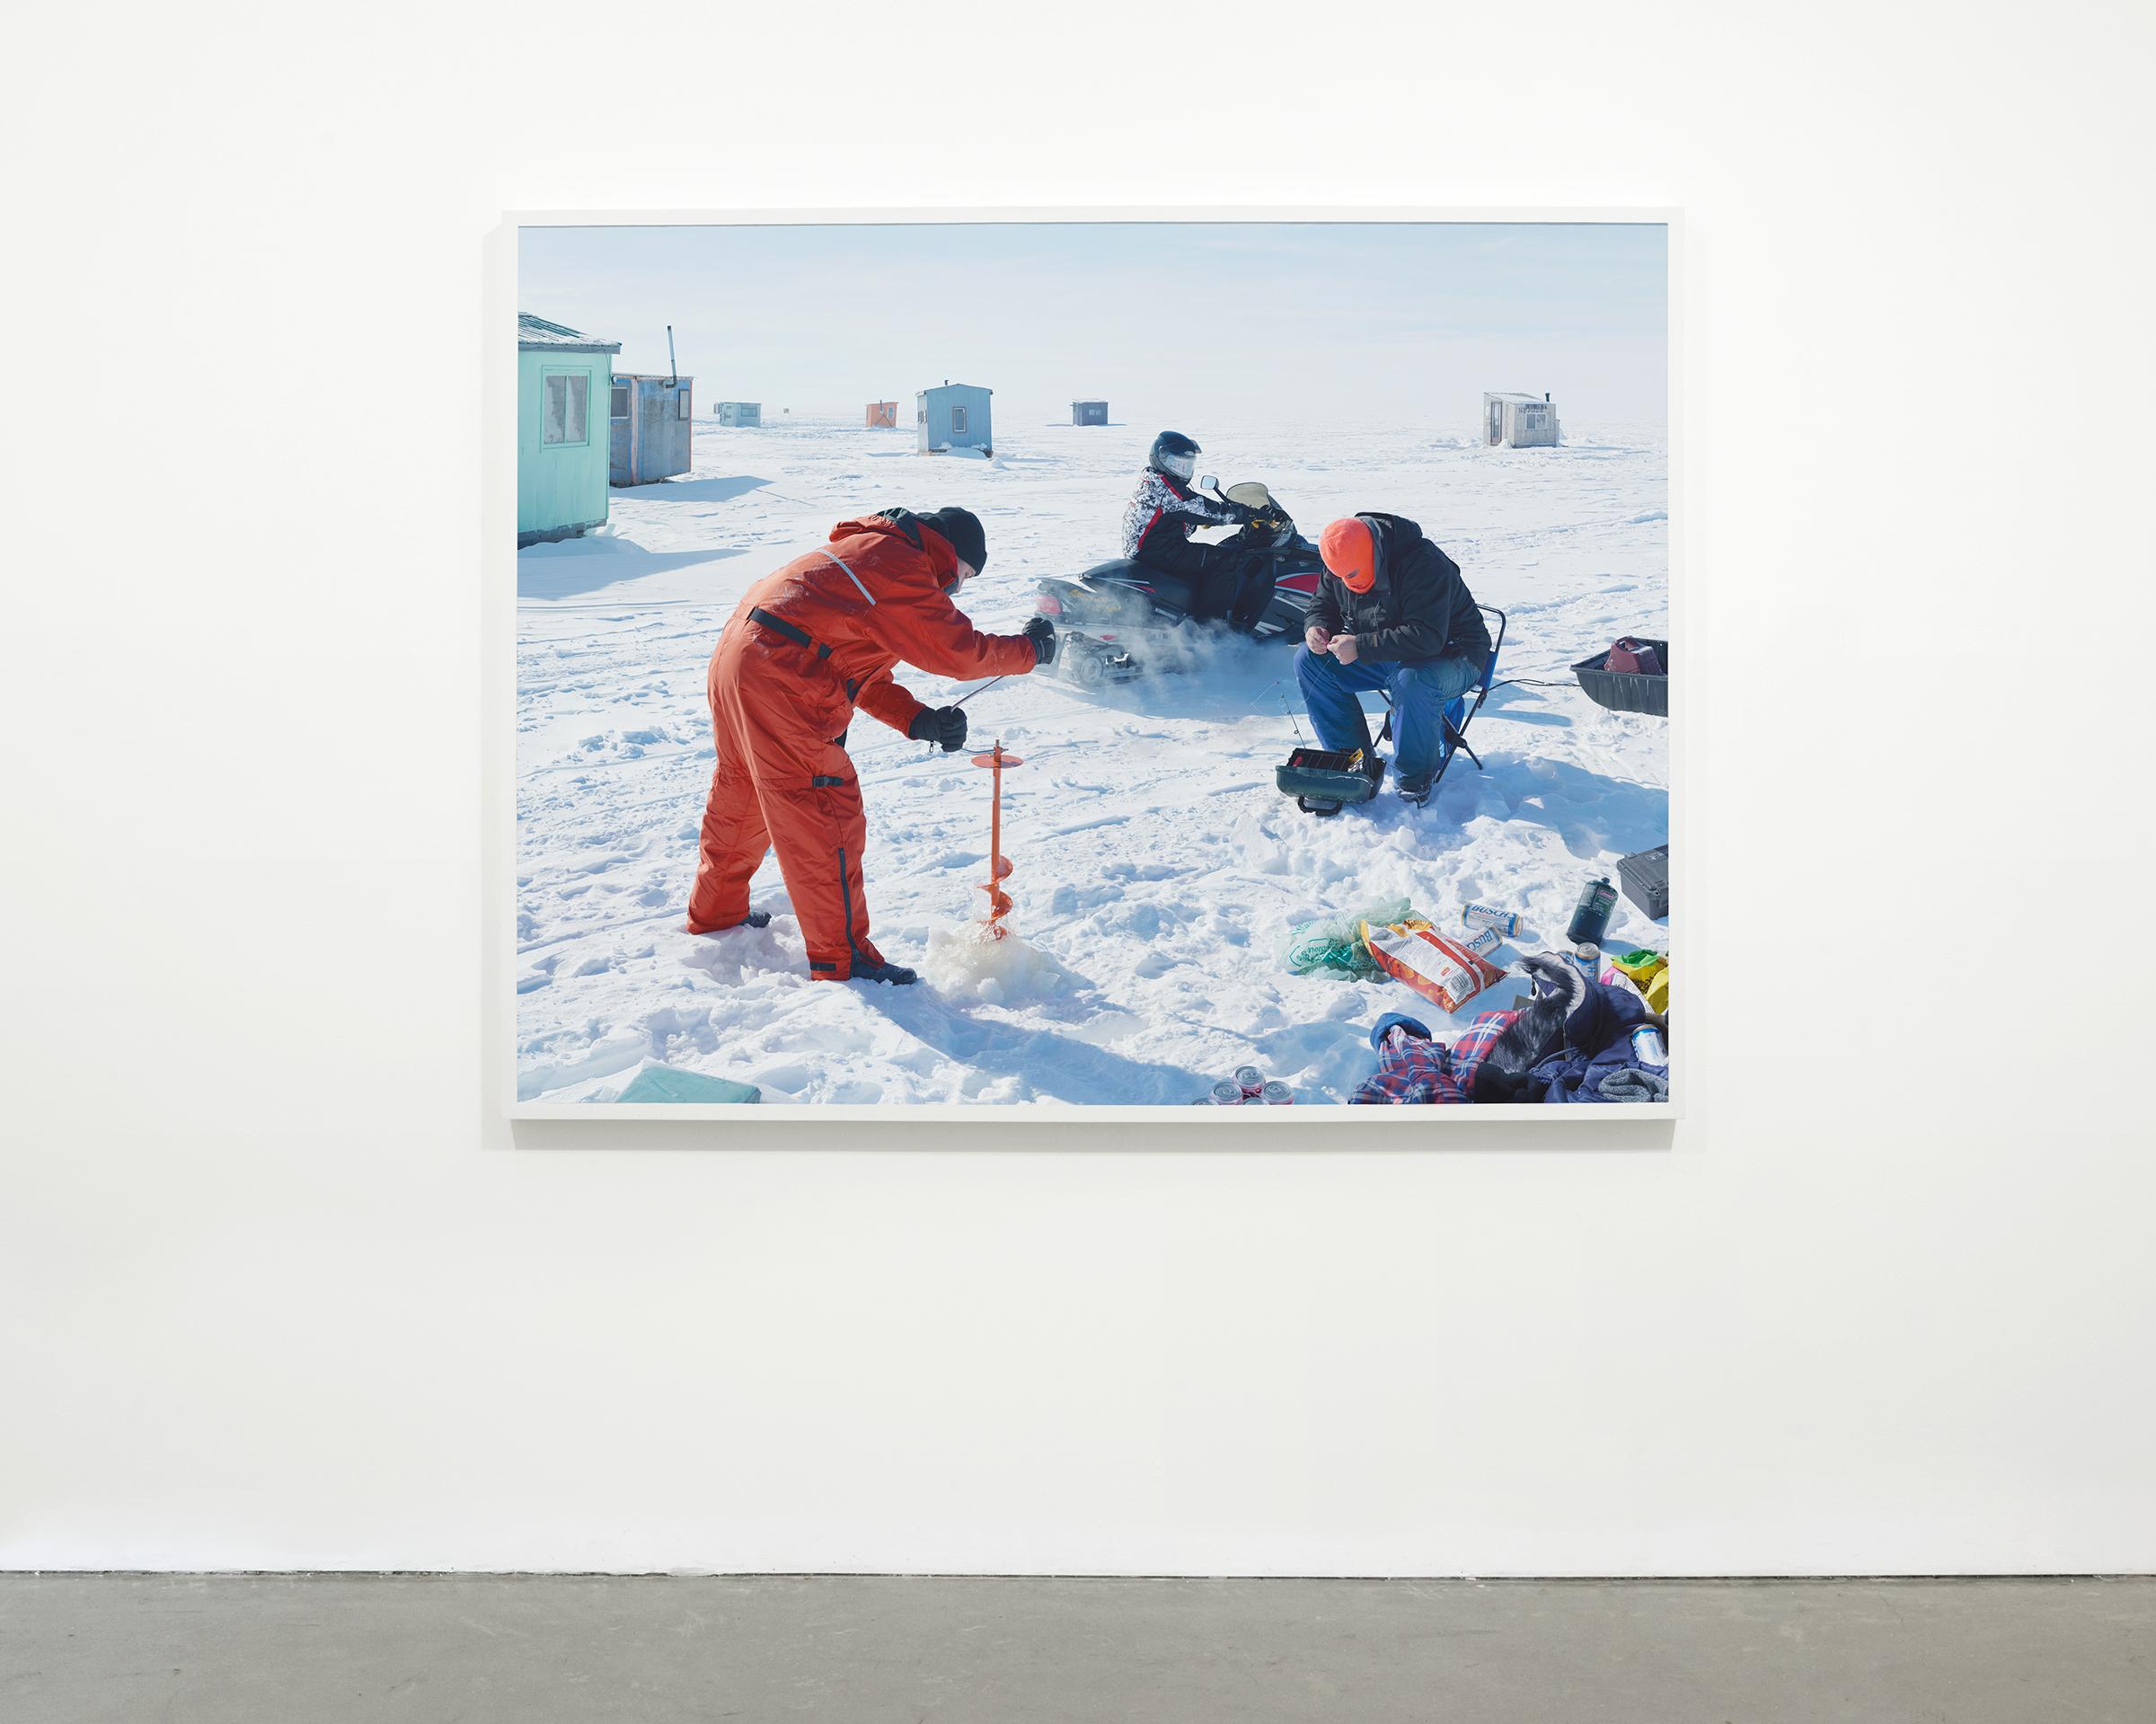 """Ice Fishing"", 2015  54 x 70.5 in. (137.15 x 179.07 cm)"